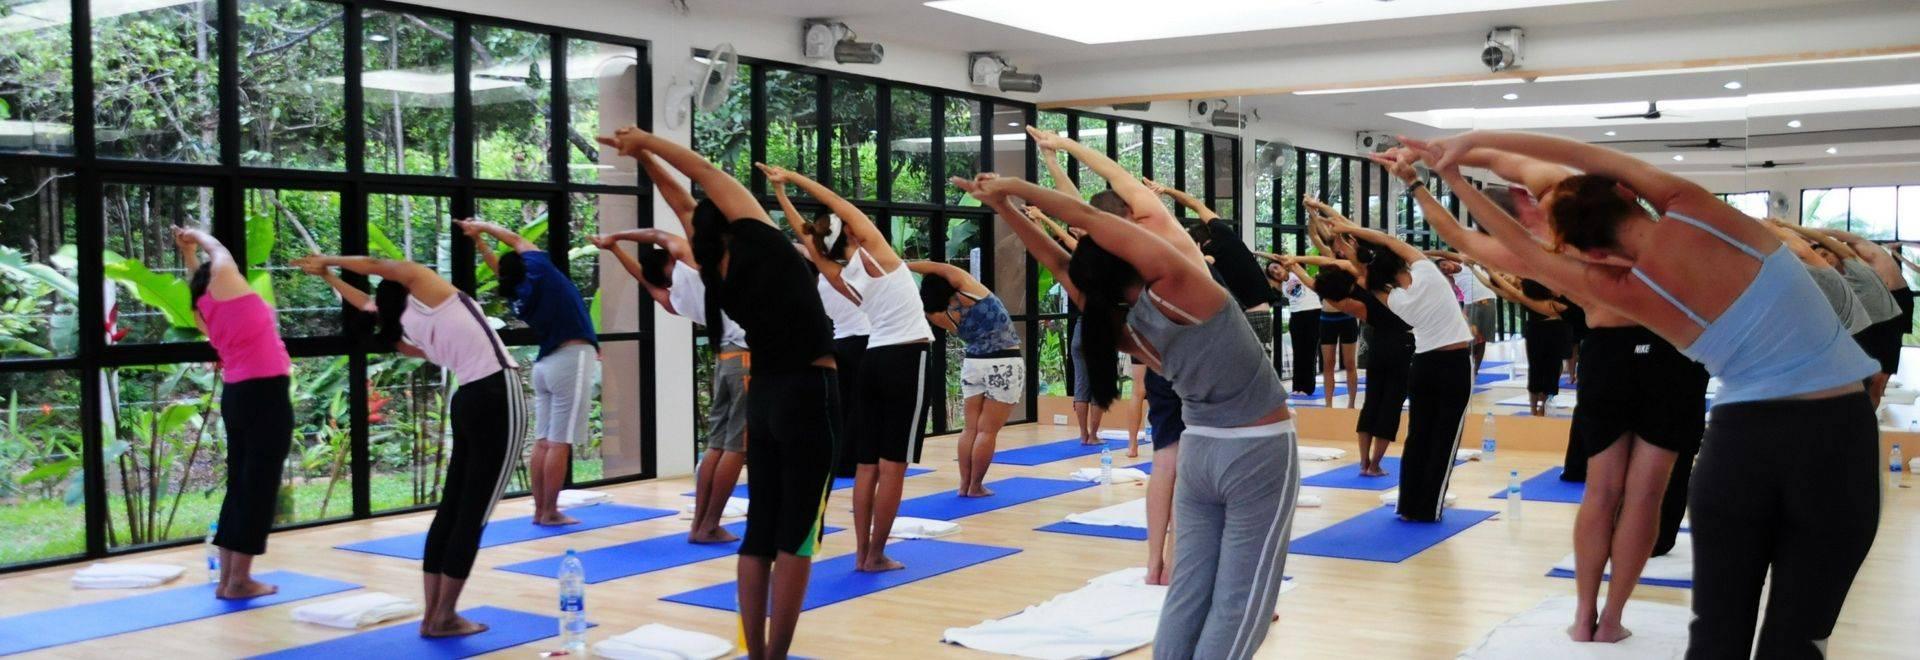 Absolute-Sanctuary-yoga-class.jpg